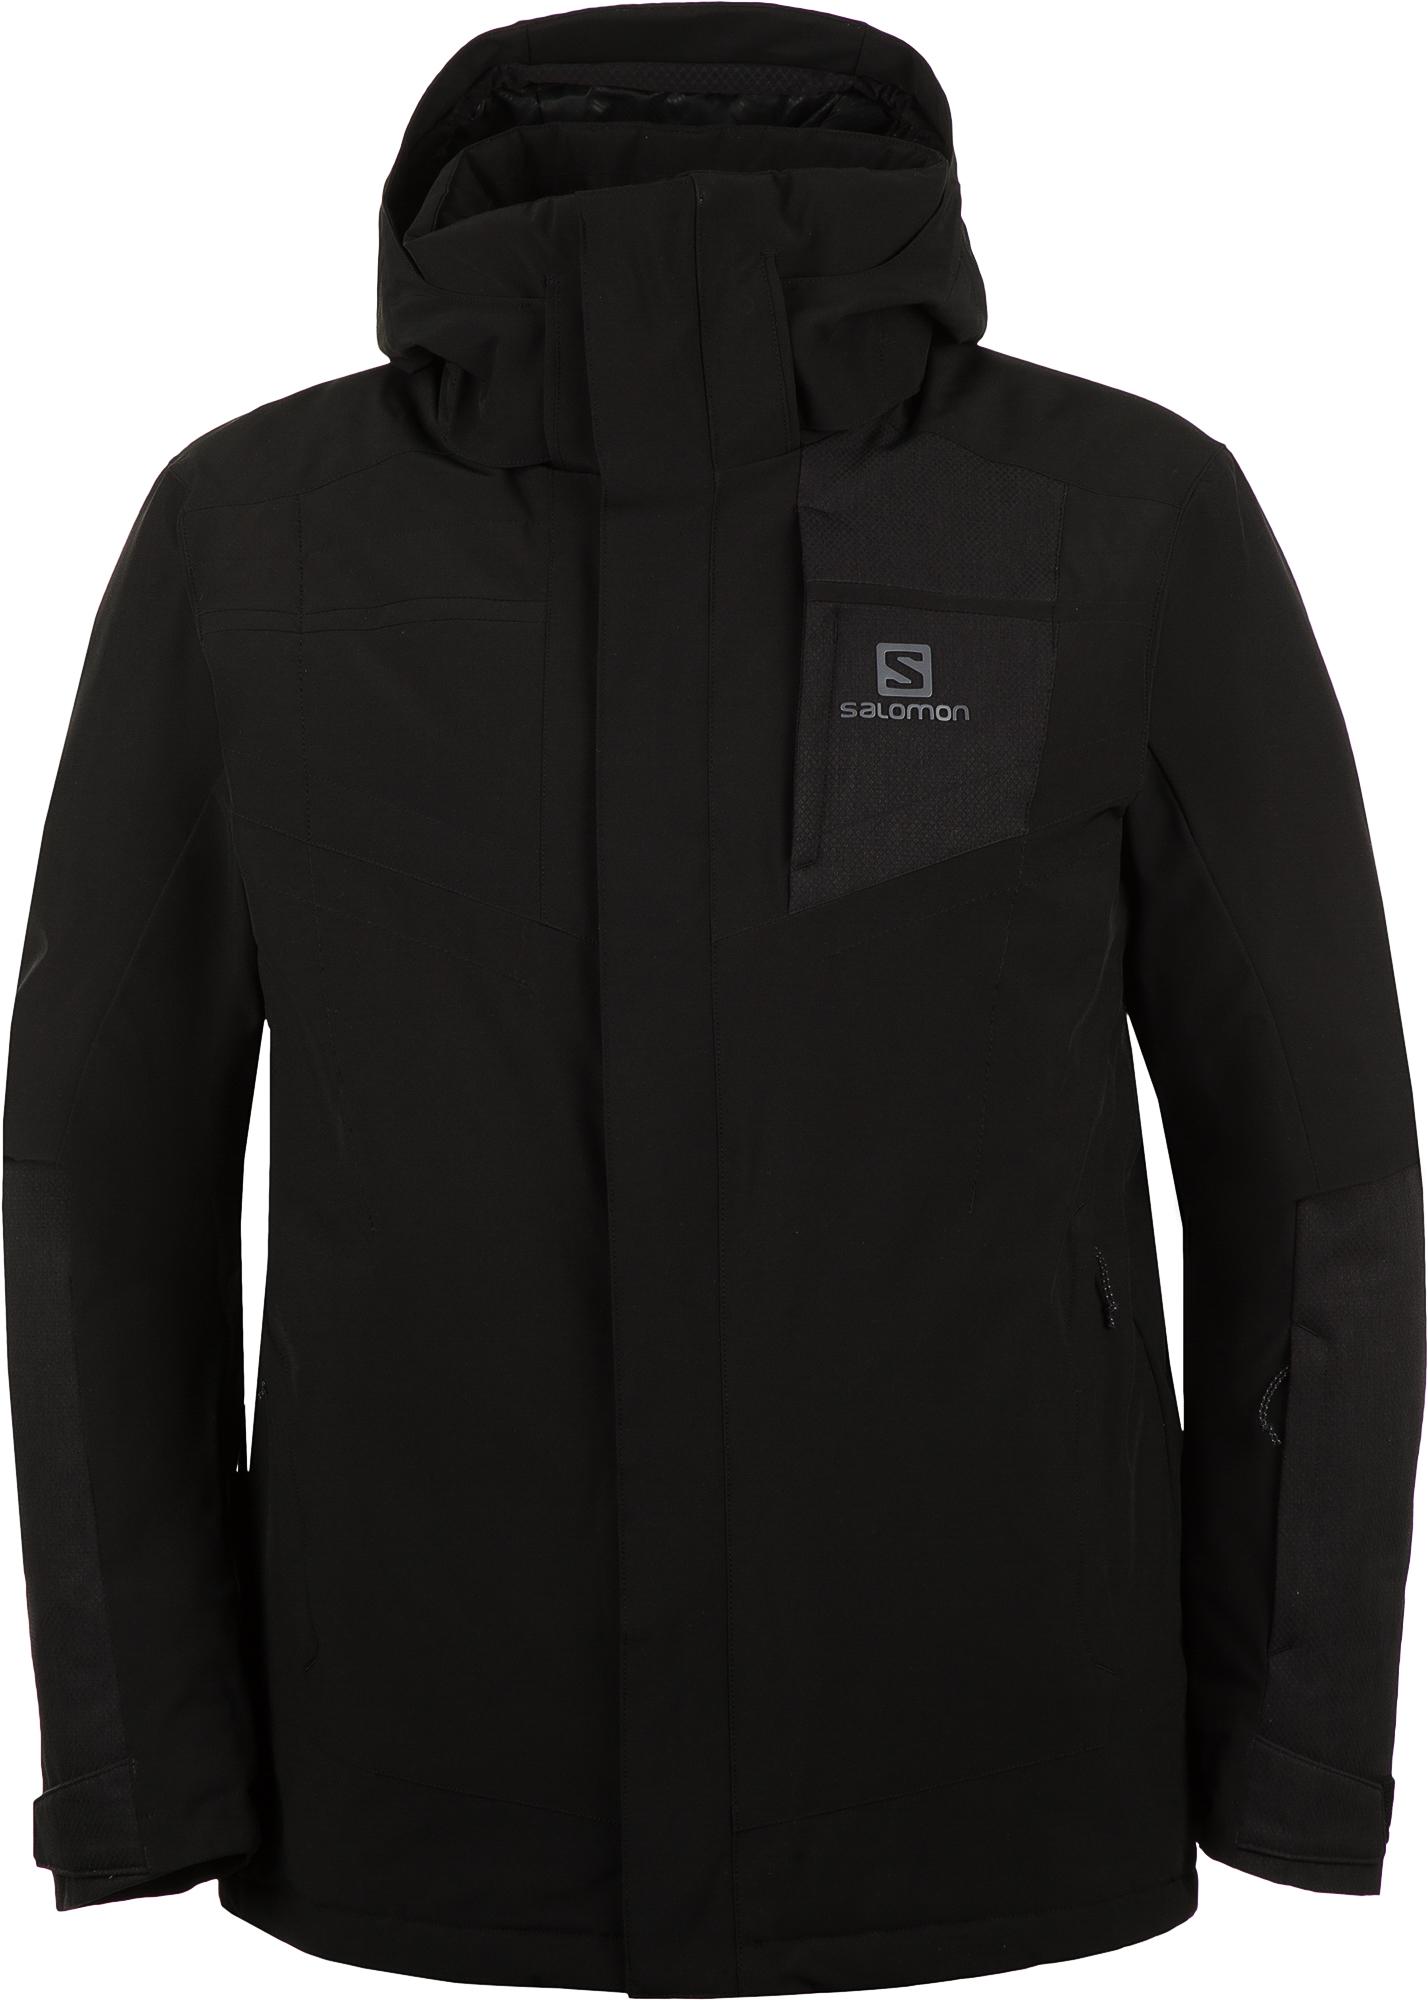 цена Salomon Куртка утепленная мужская Salomon Stormstrong, размер 44-46 онлайн в 2017 году